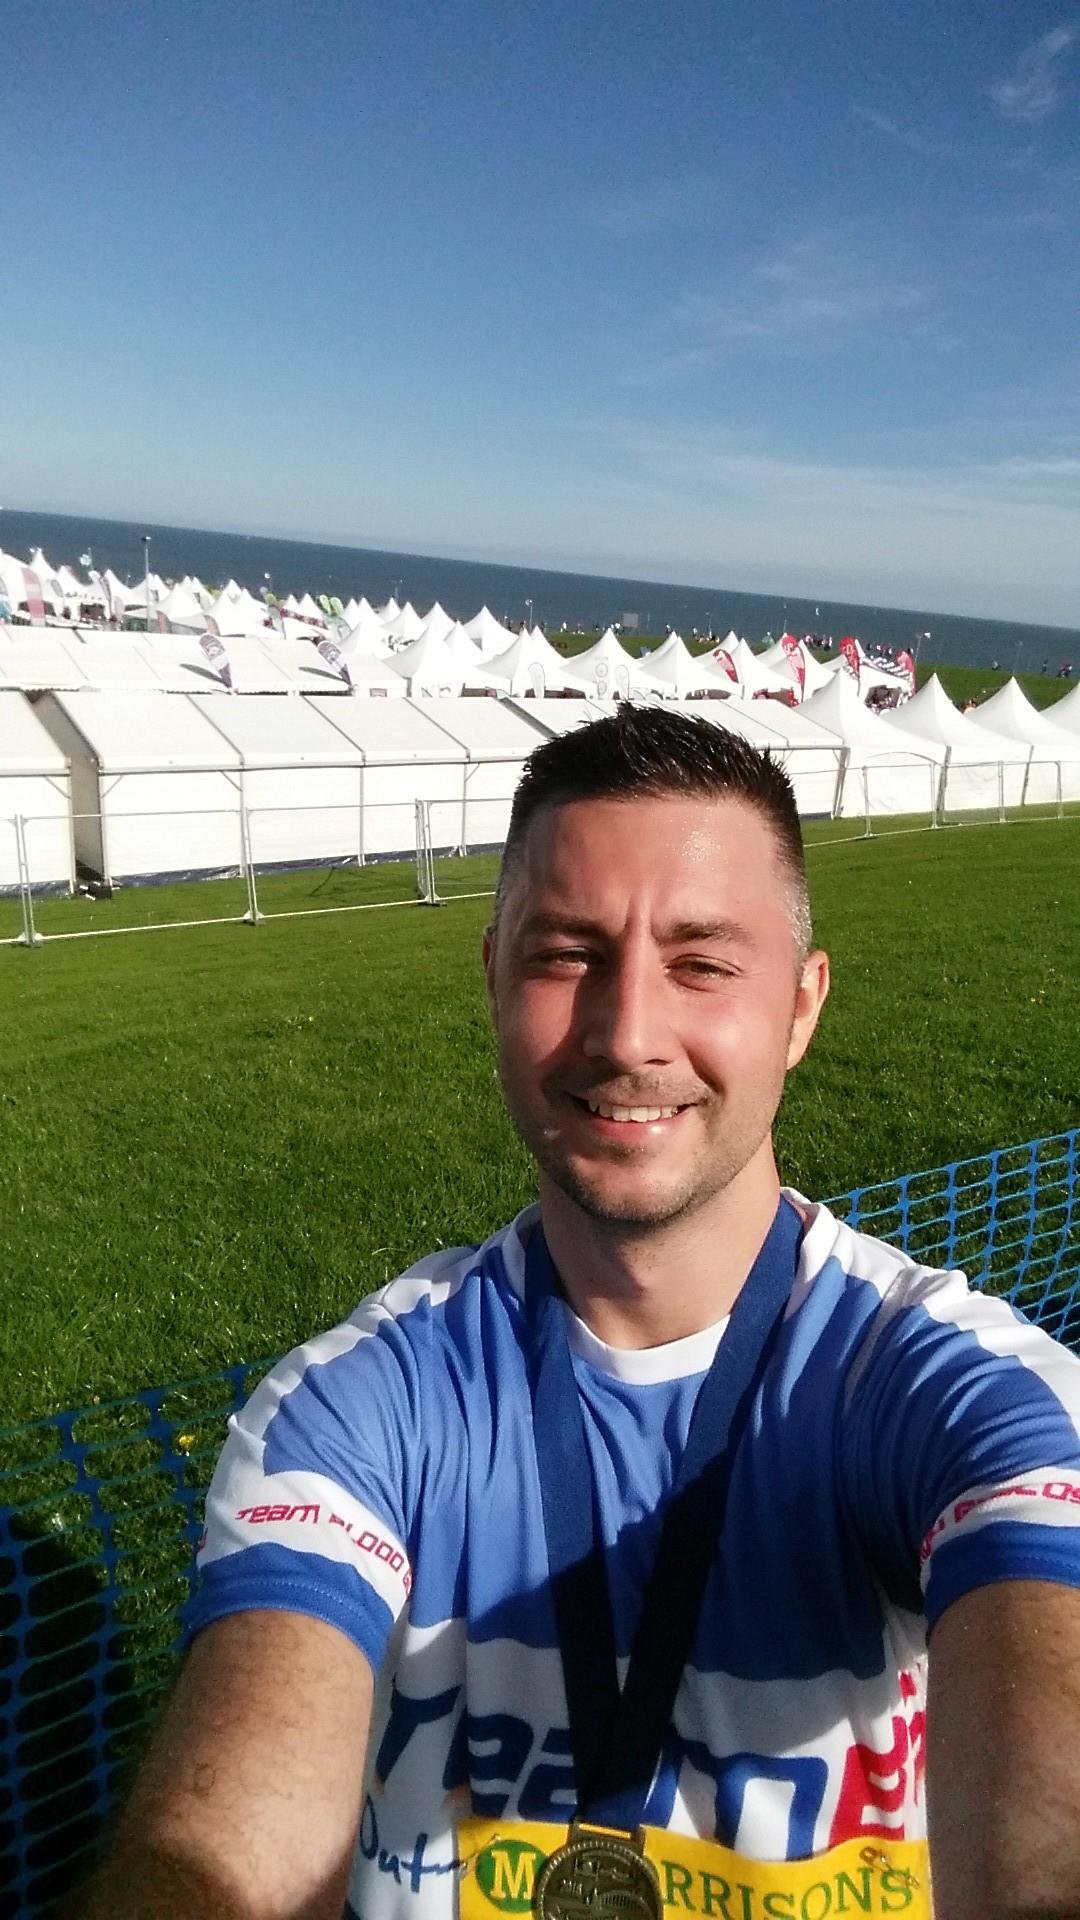 Becoming a Type 1 Diabetic Multi-marathoner, CGM, xDrip and